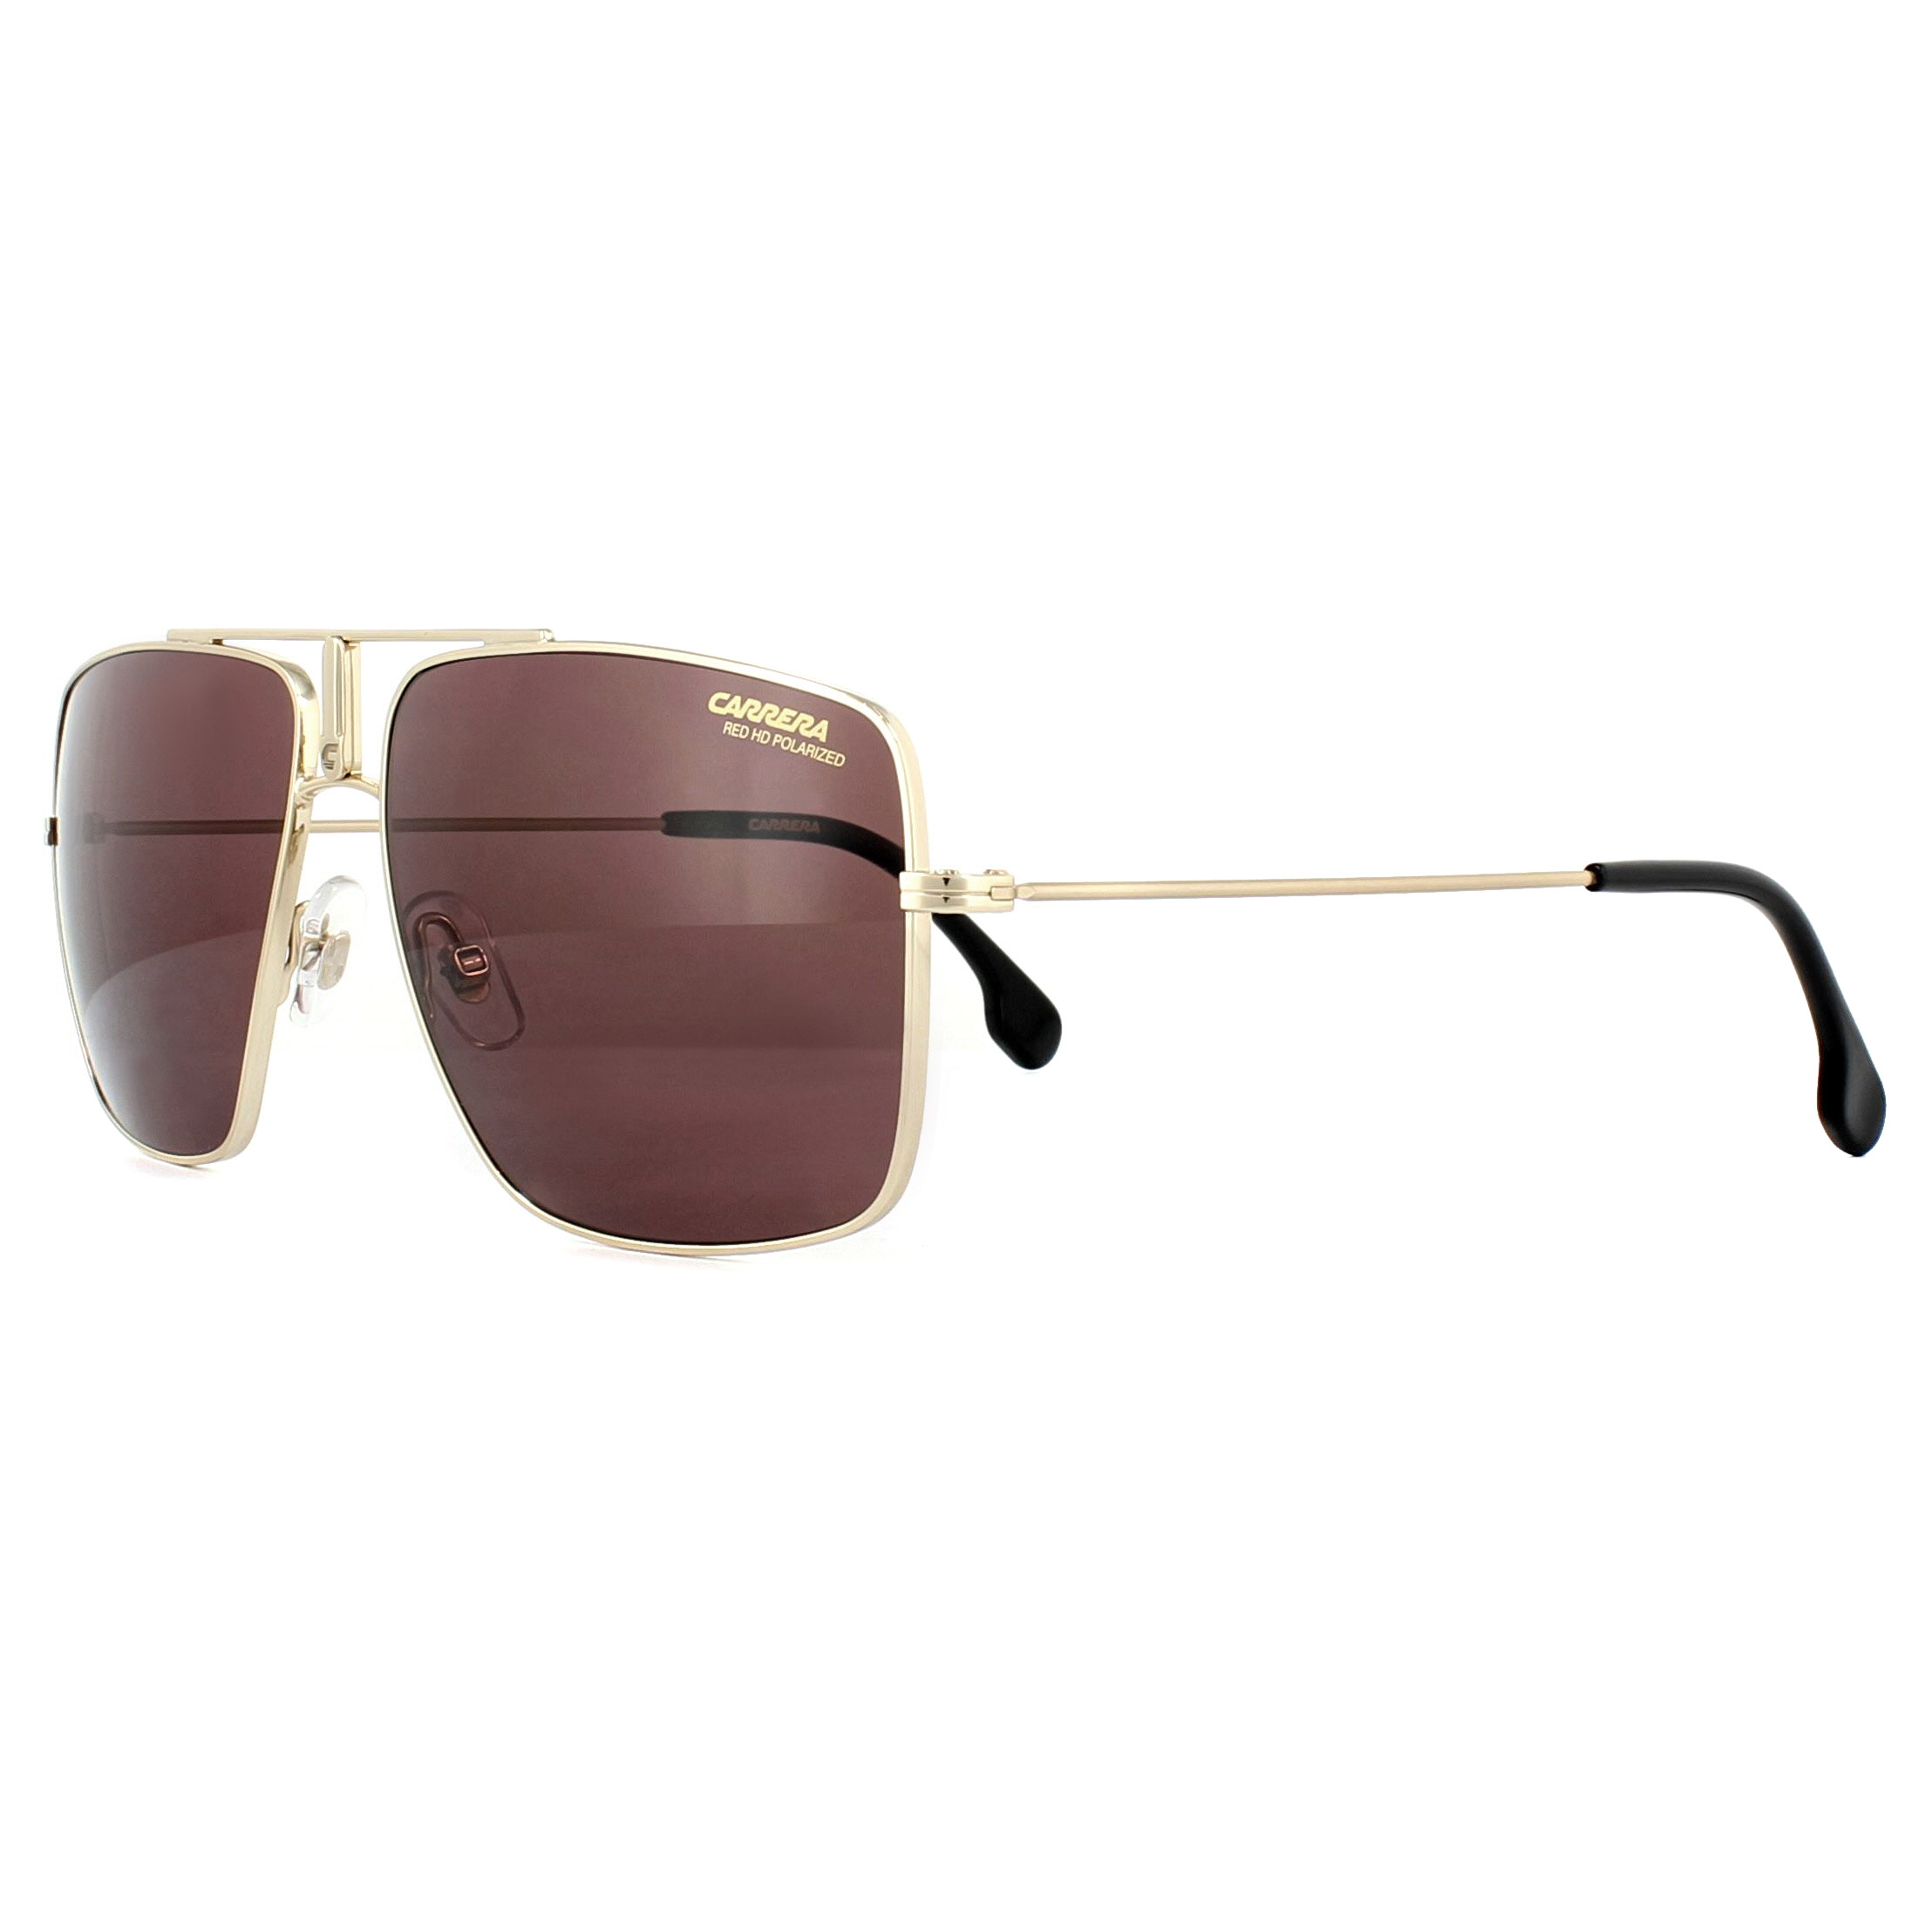 472c74ba4c Cheap Carrera 1006 S Sunglasses - Discounted Sunglasses